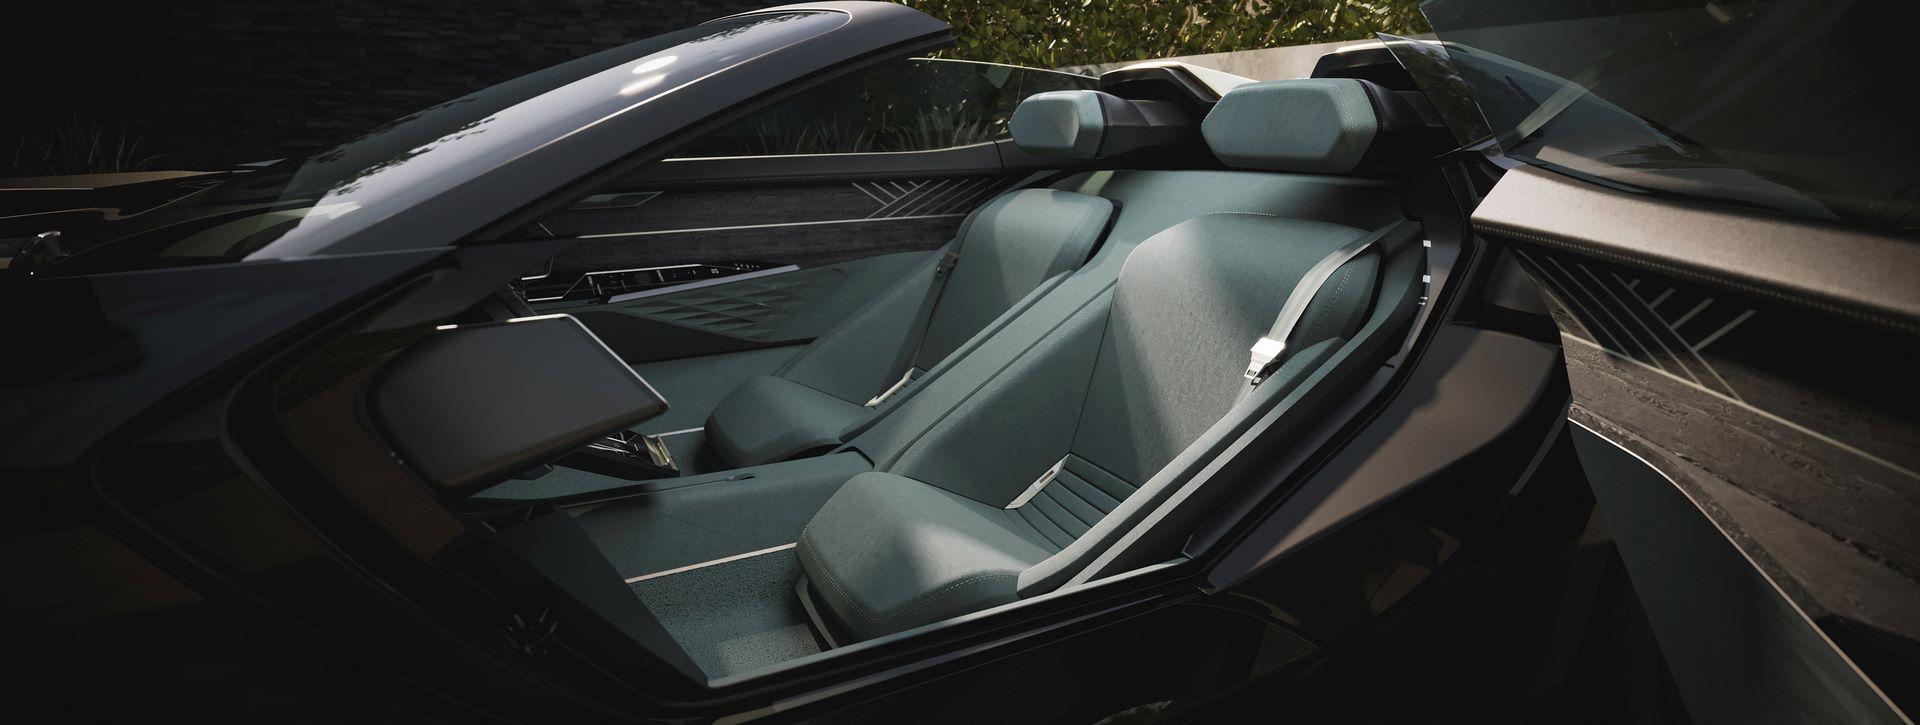 Audi-Skysphere-Concept-20